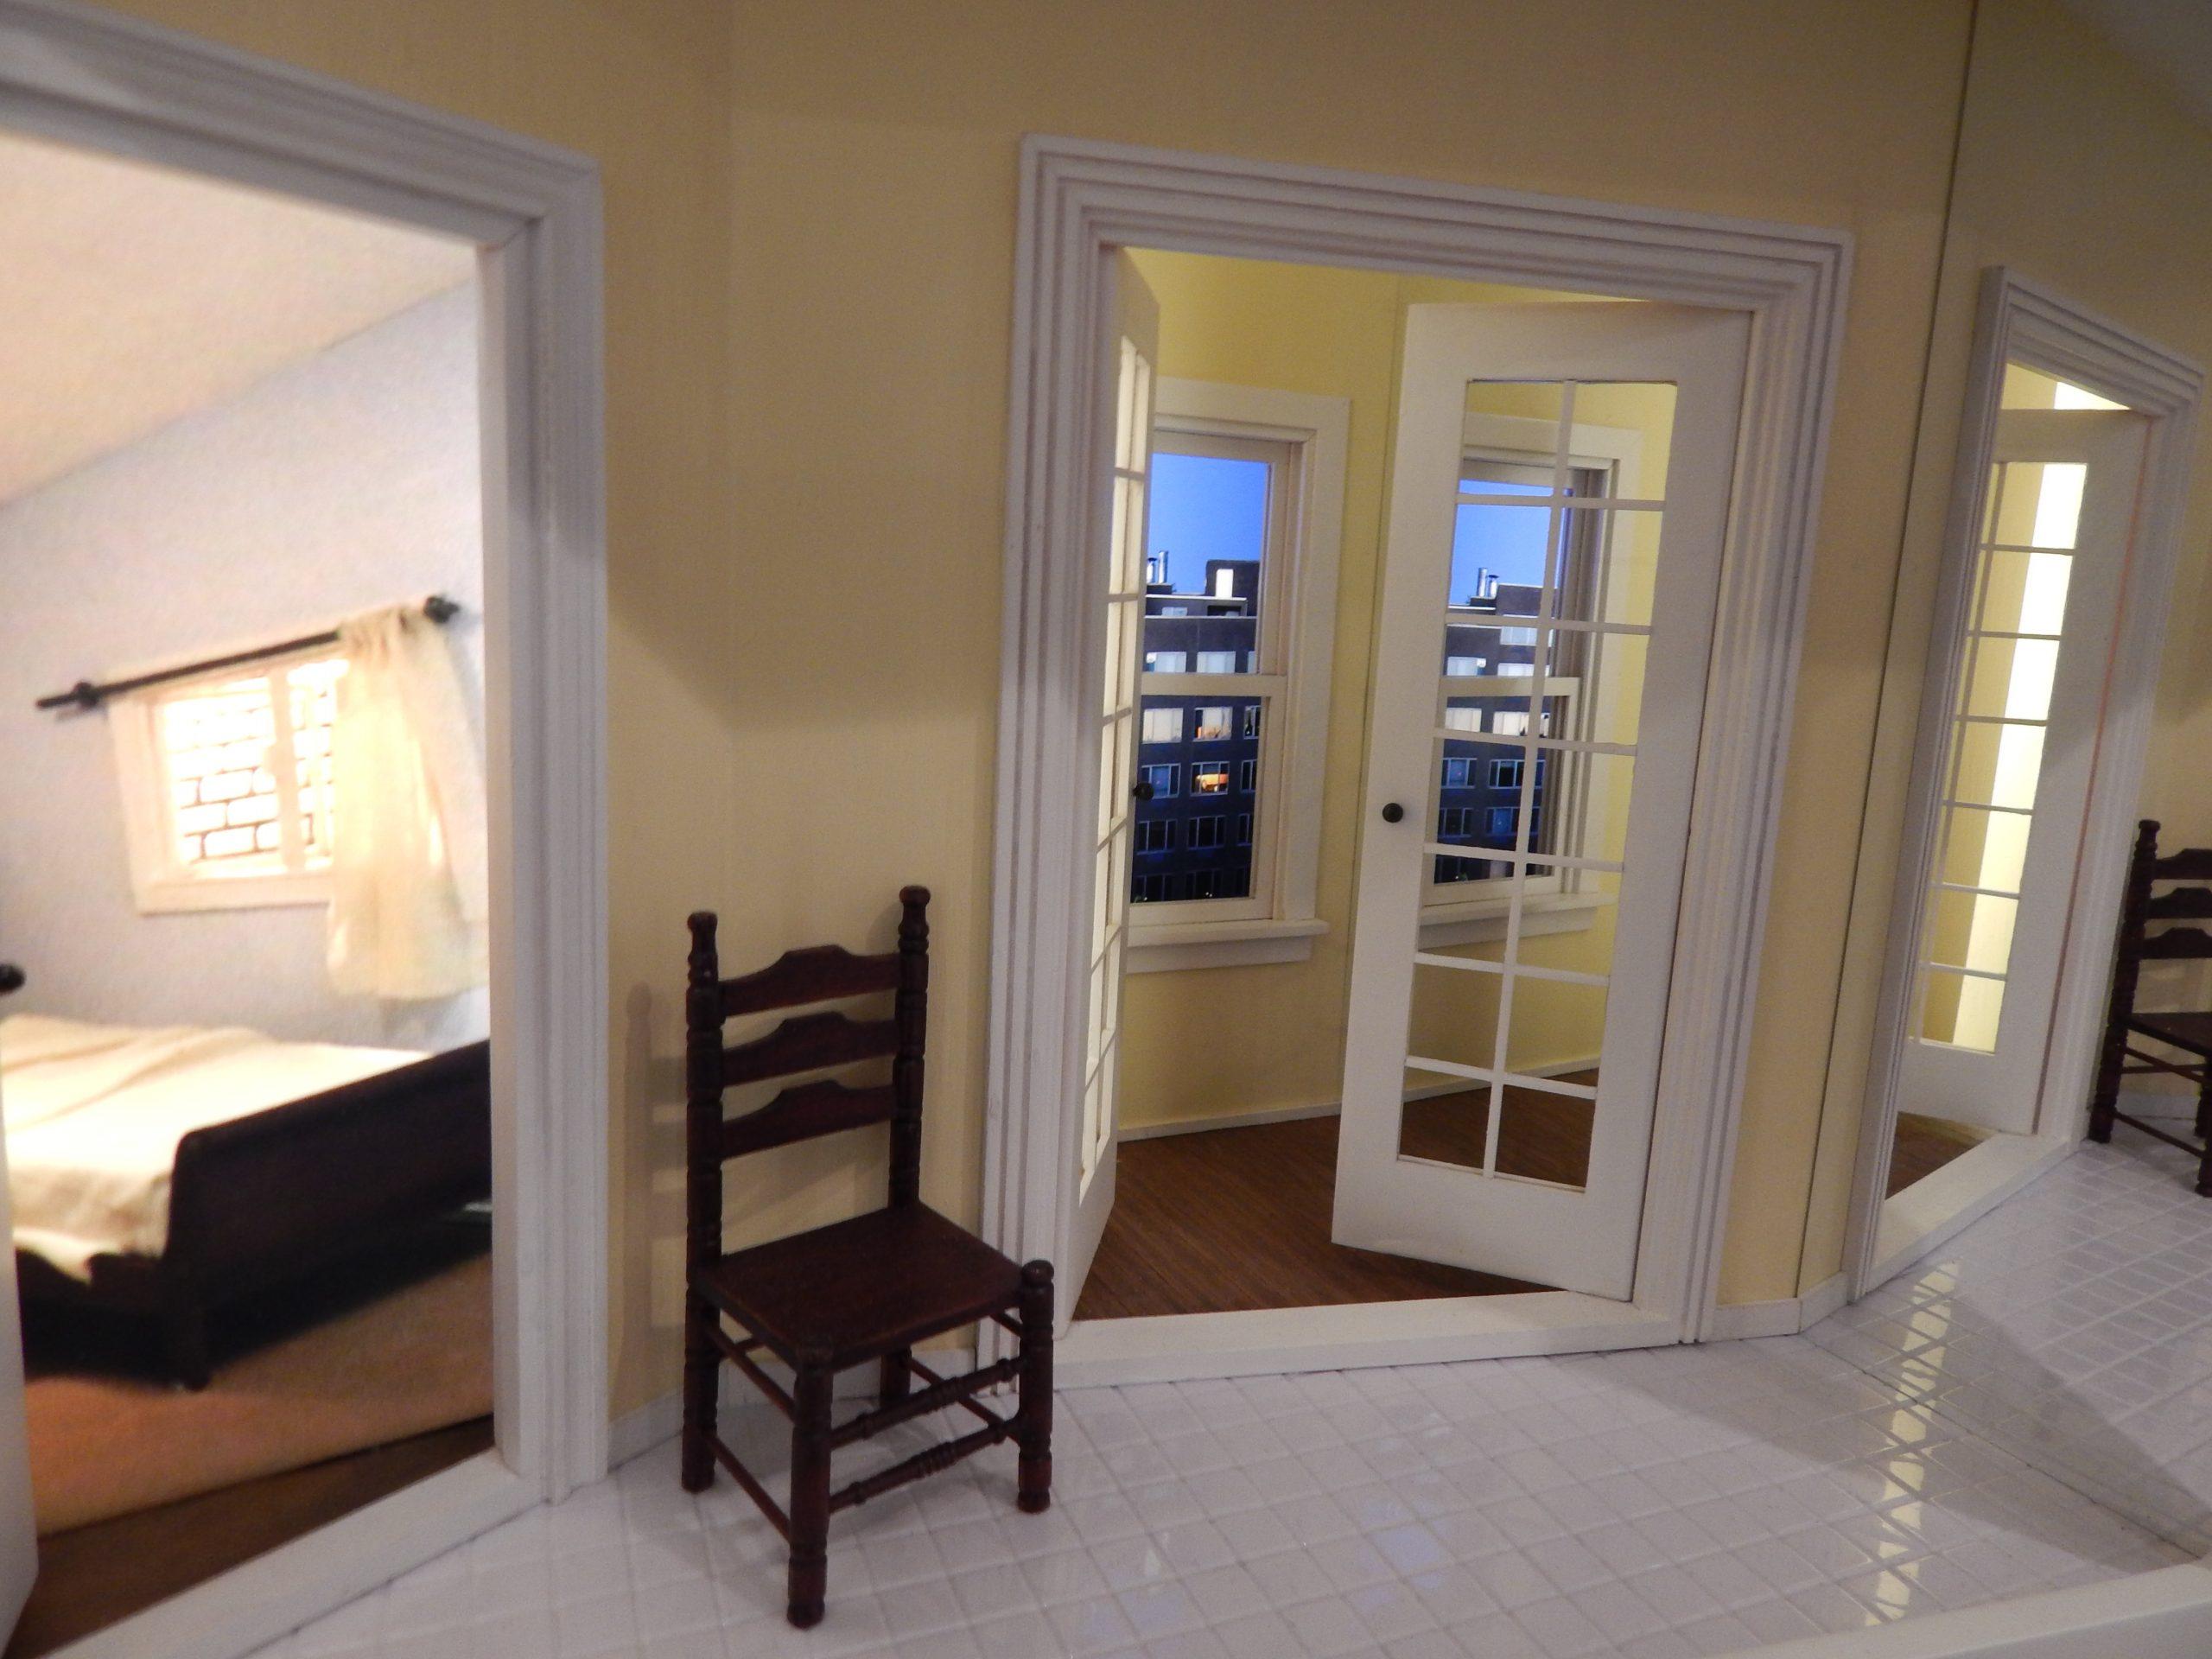 Susan Leopold's <i>One Room</i>